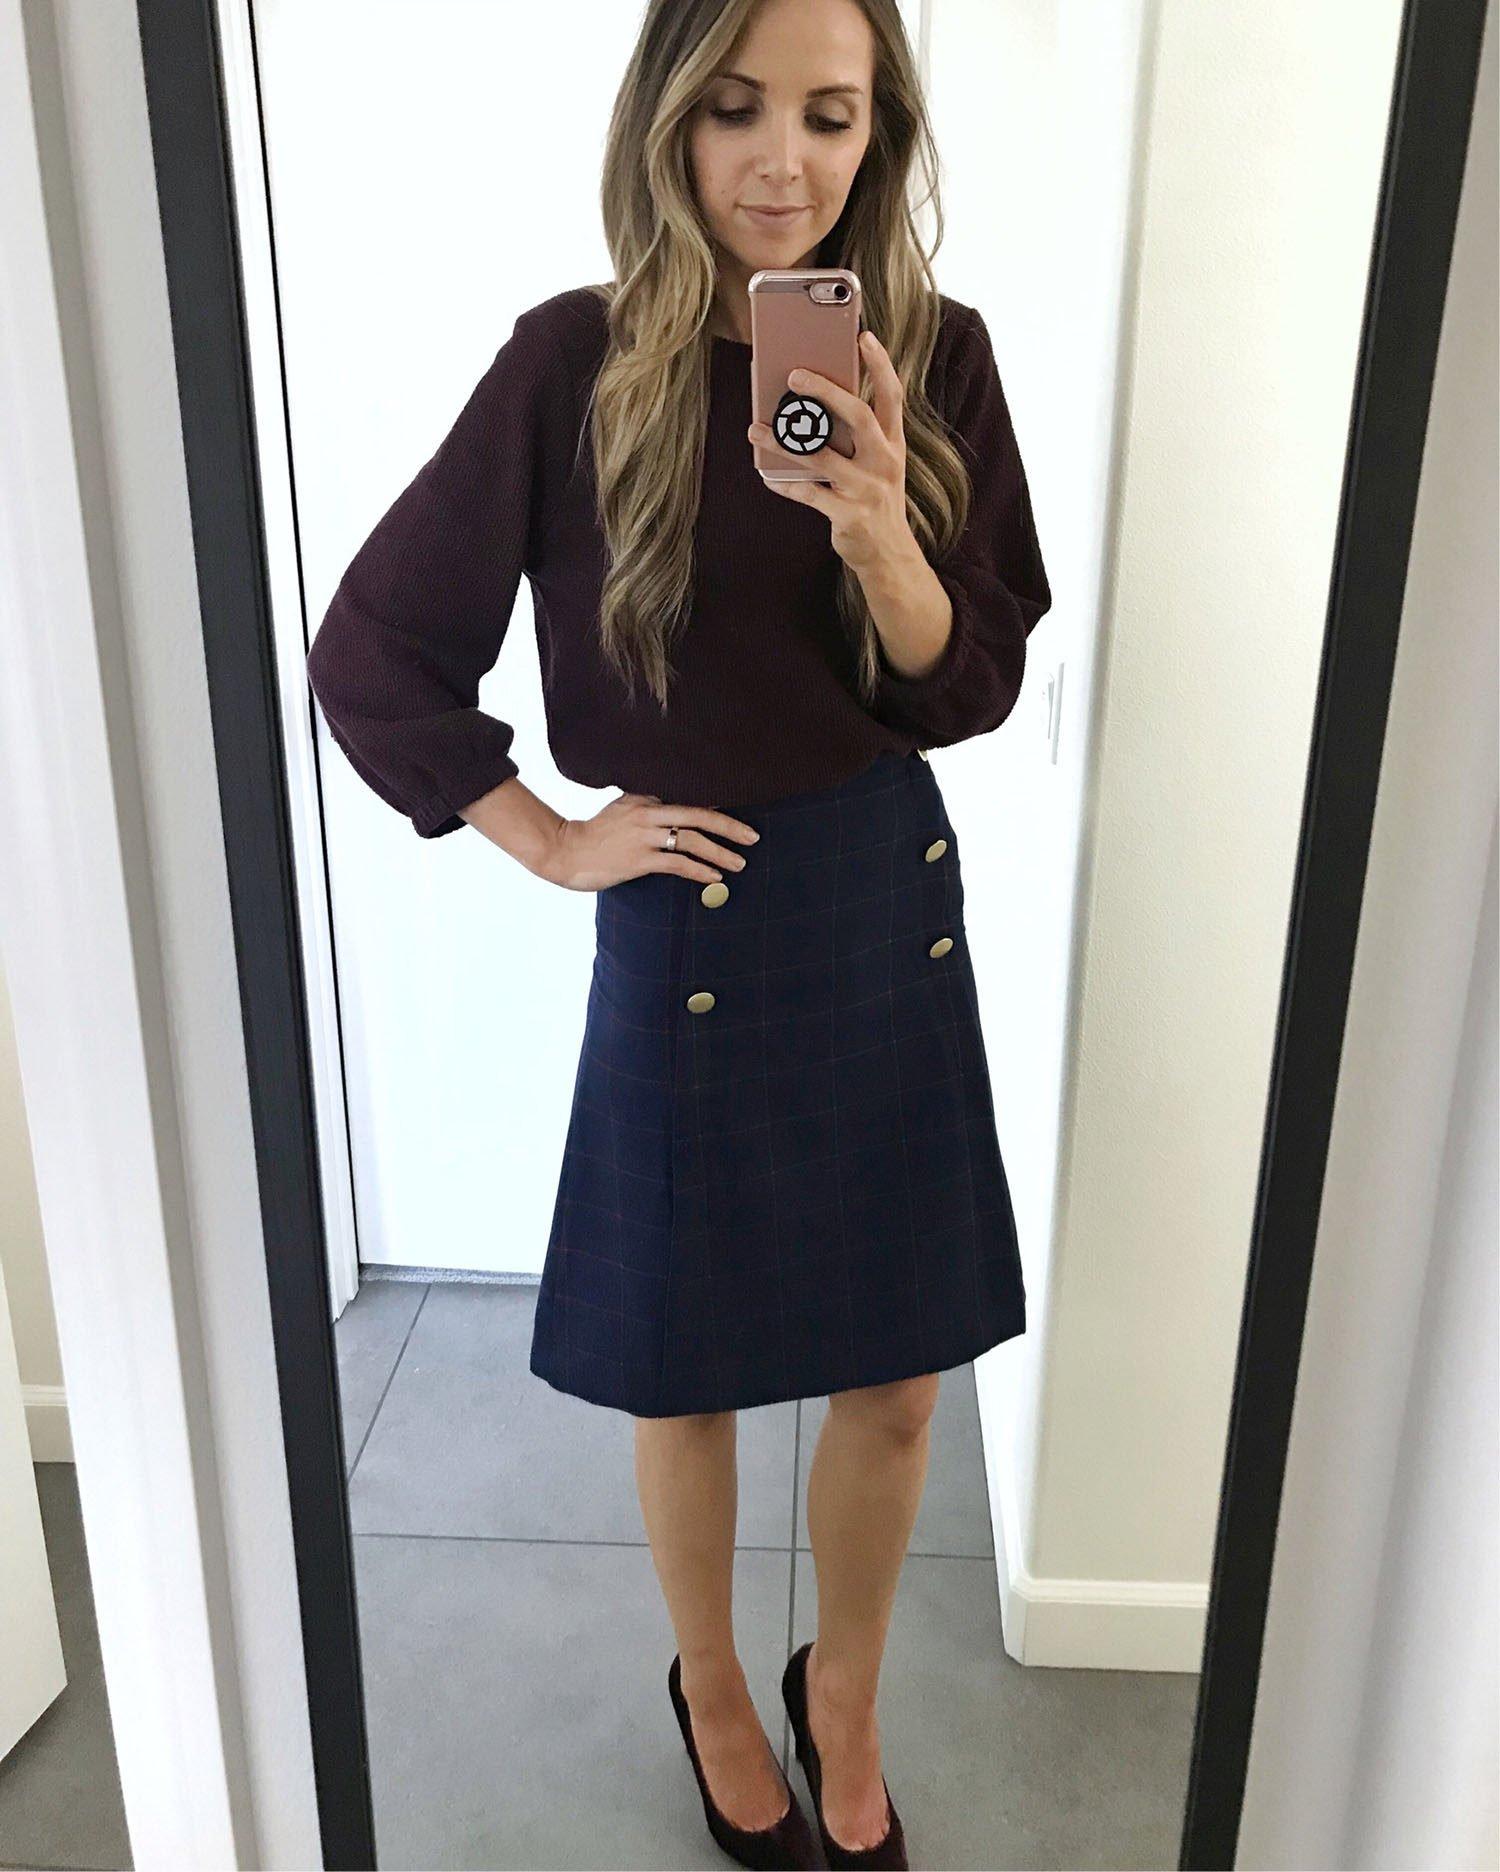 plaid skirt and sweater | merricksart.com